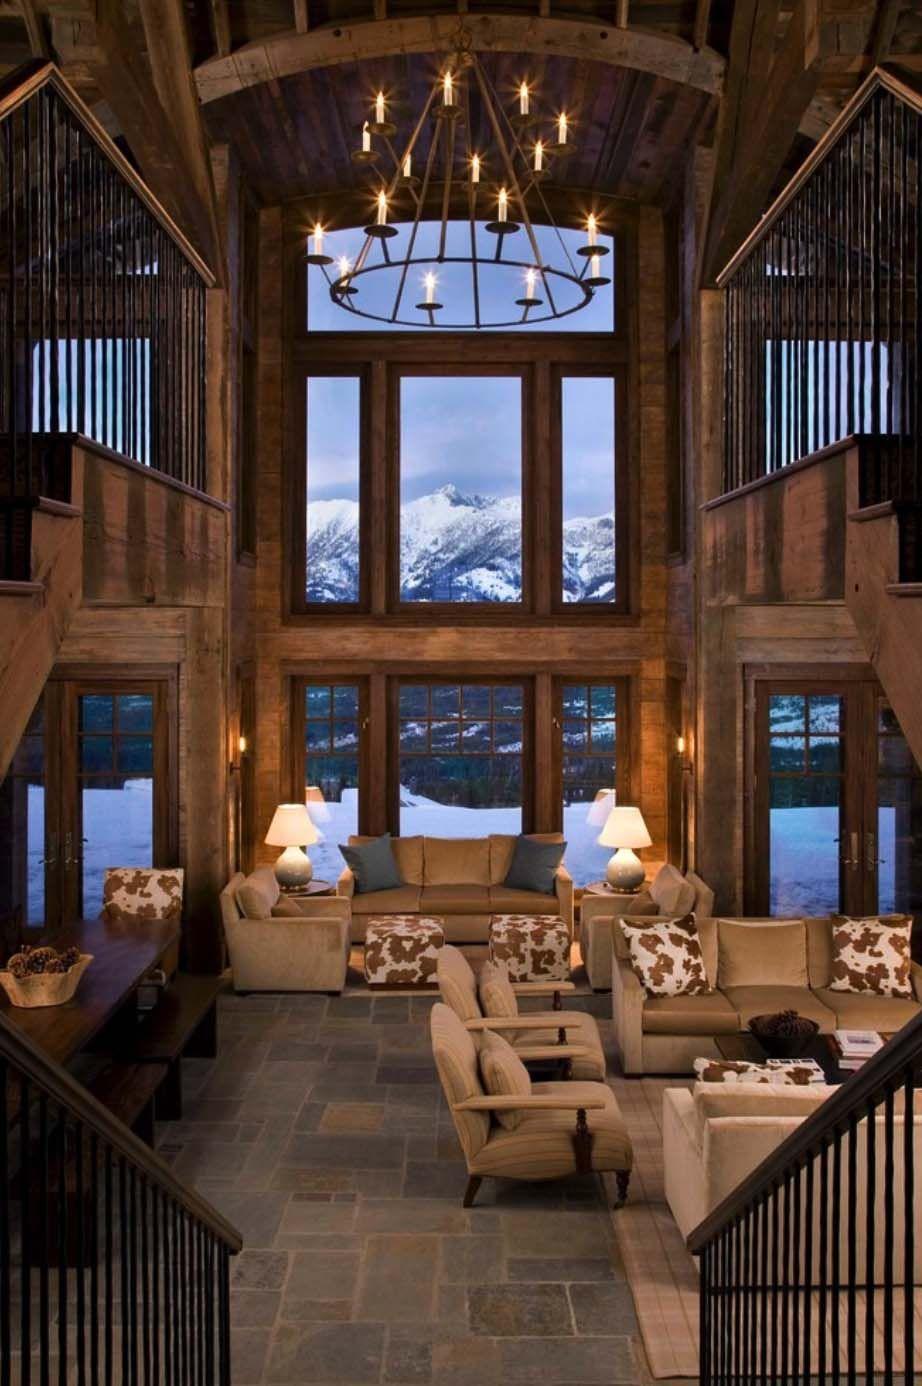 Rustic Mountain Retreat In Big Sky Resembles Lodge